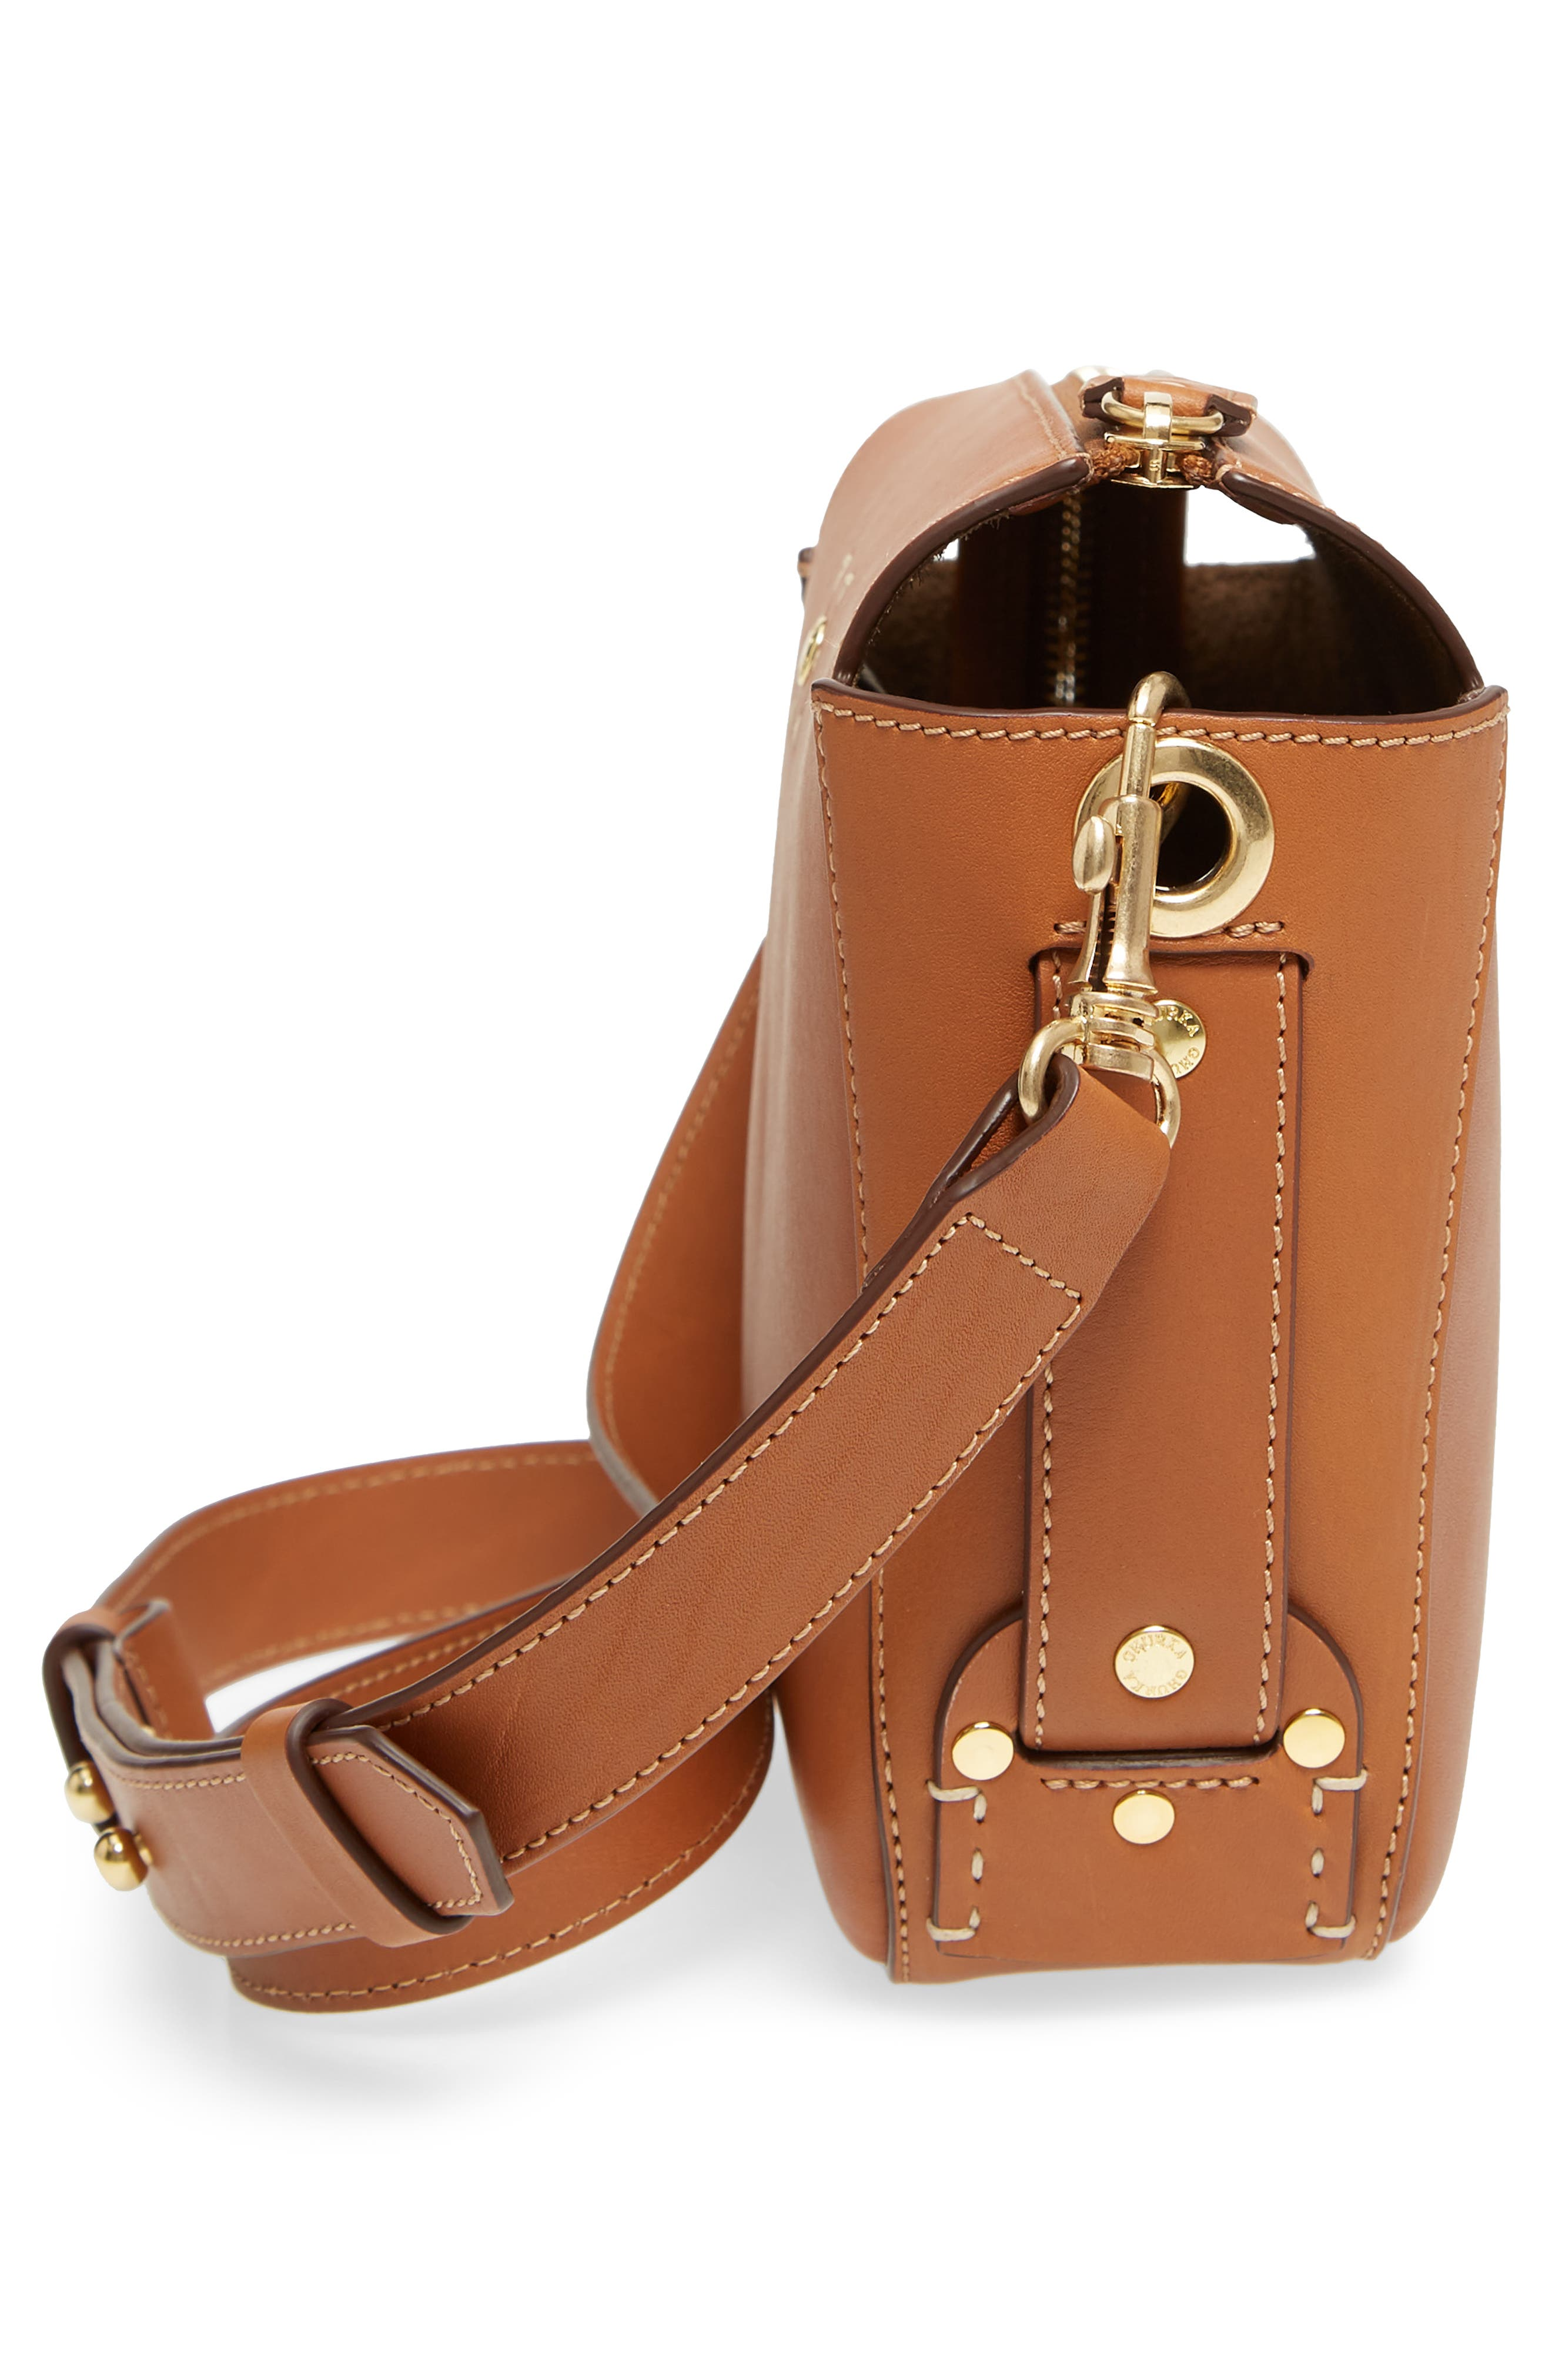 Tilley Leather Crossbody Bag,                             Alternate thumbnail 5, color,                             CHESTNUT